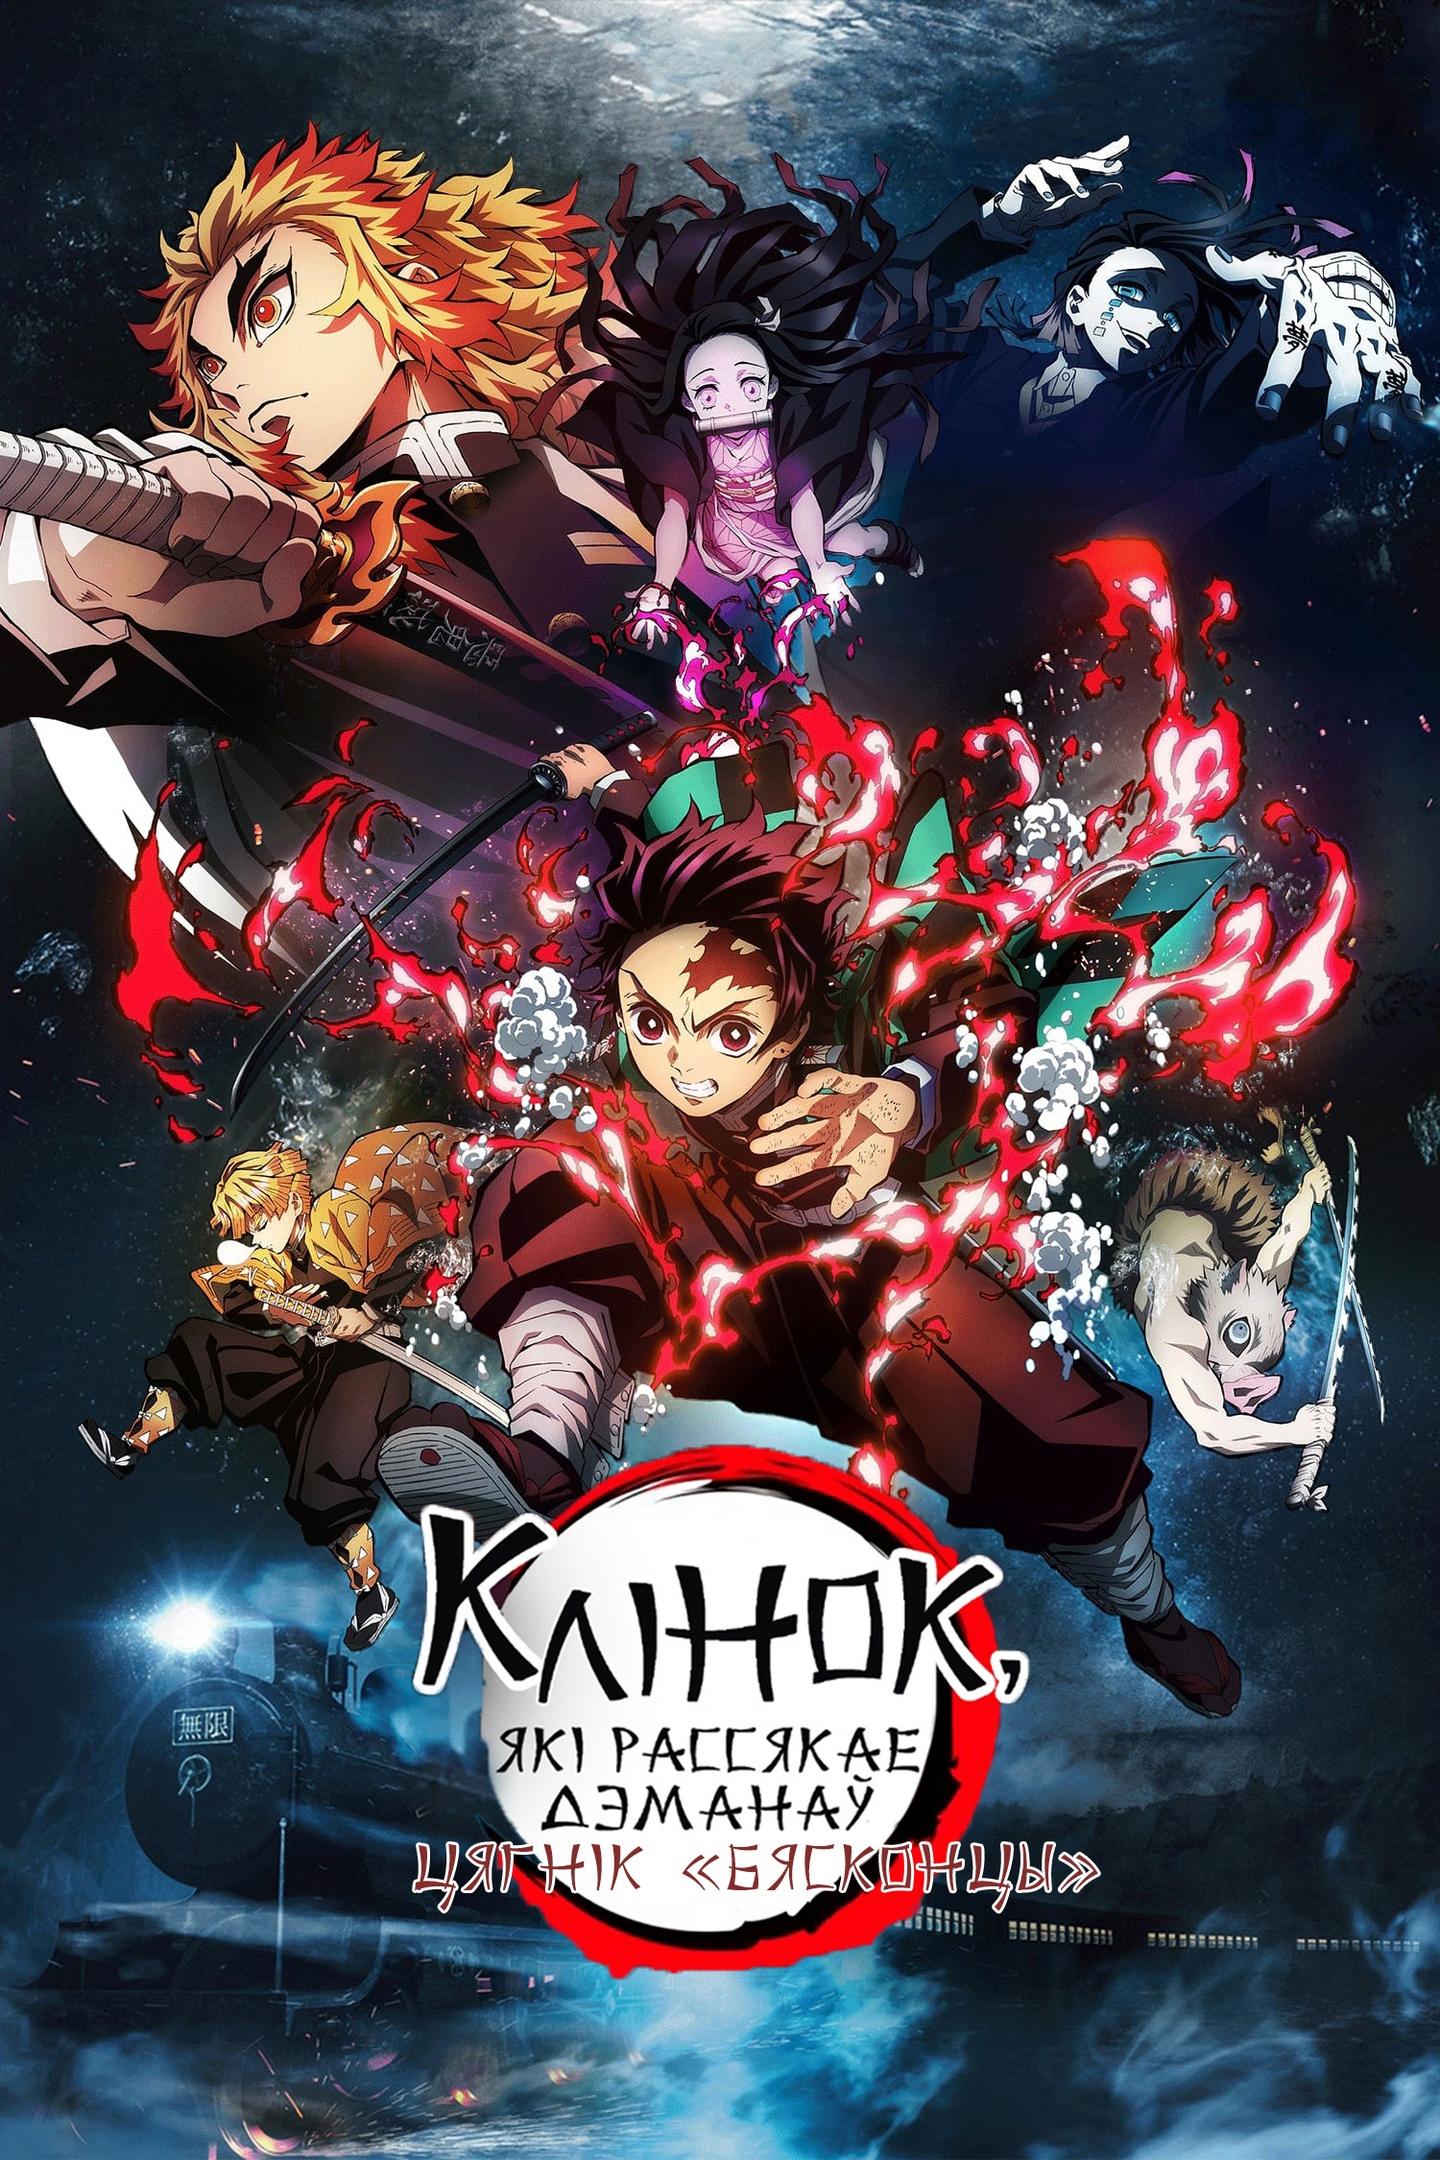 Kimetsu no Yaiba Movie: Mugen Ressha-hen, Клінок, які рассякае дэманаў: Цягнік «Бясконцы». Фільм, kimetsu-no-yaiba-movie:-mugen-ressha-hen